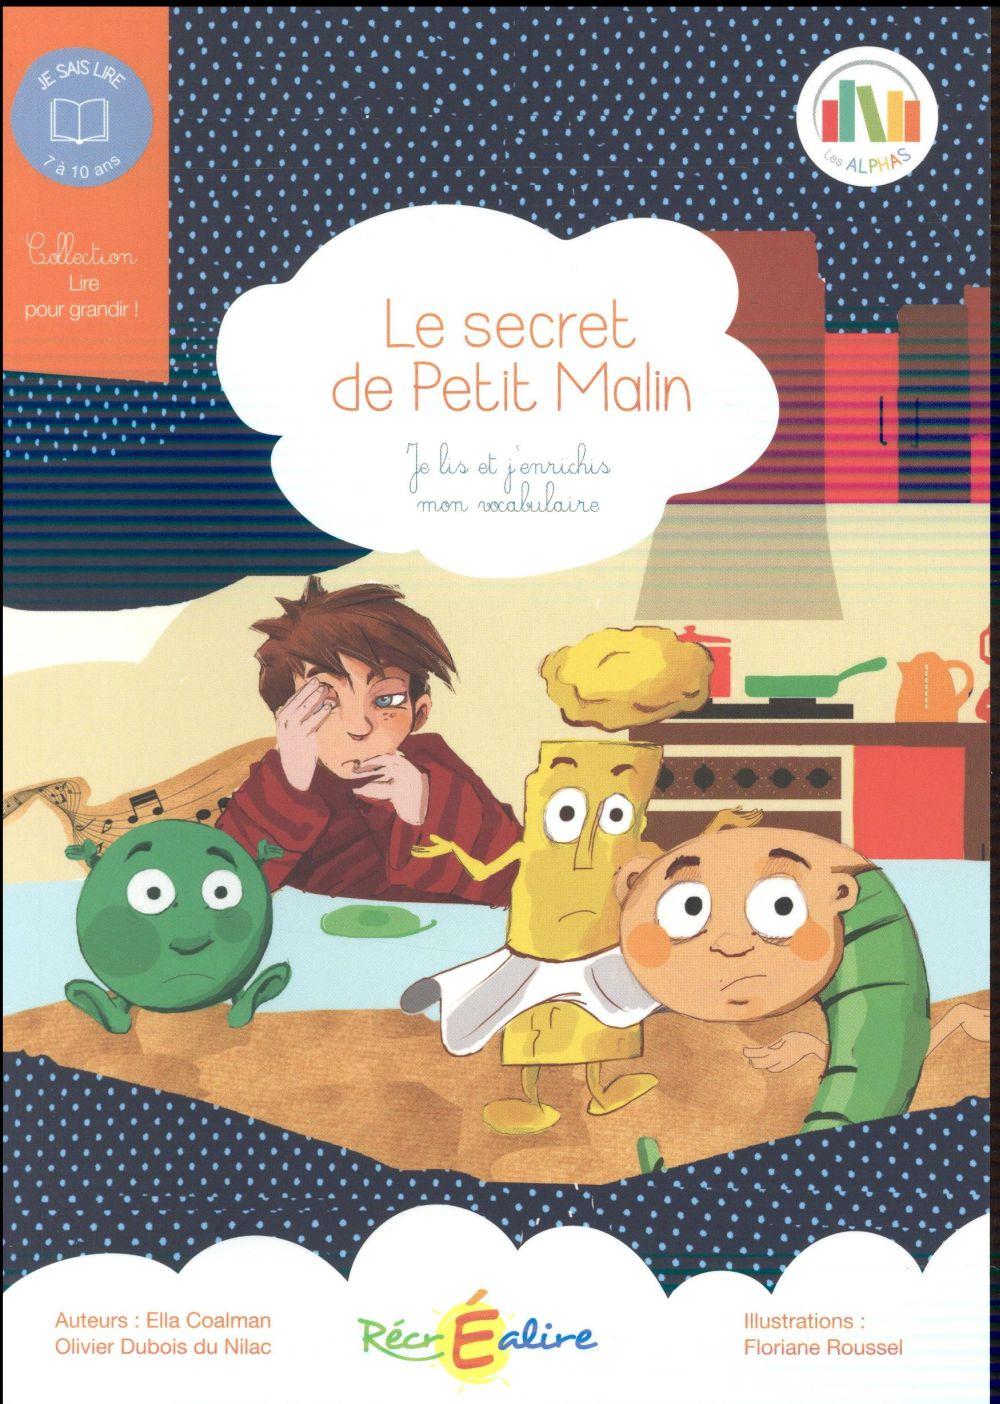 Le secret de Petit Malin